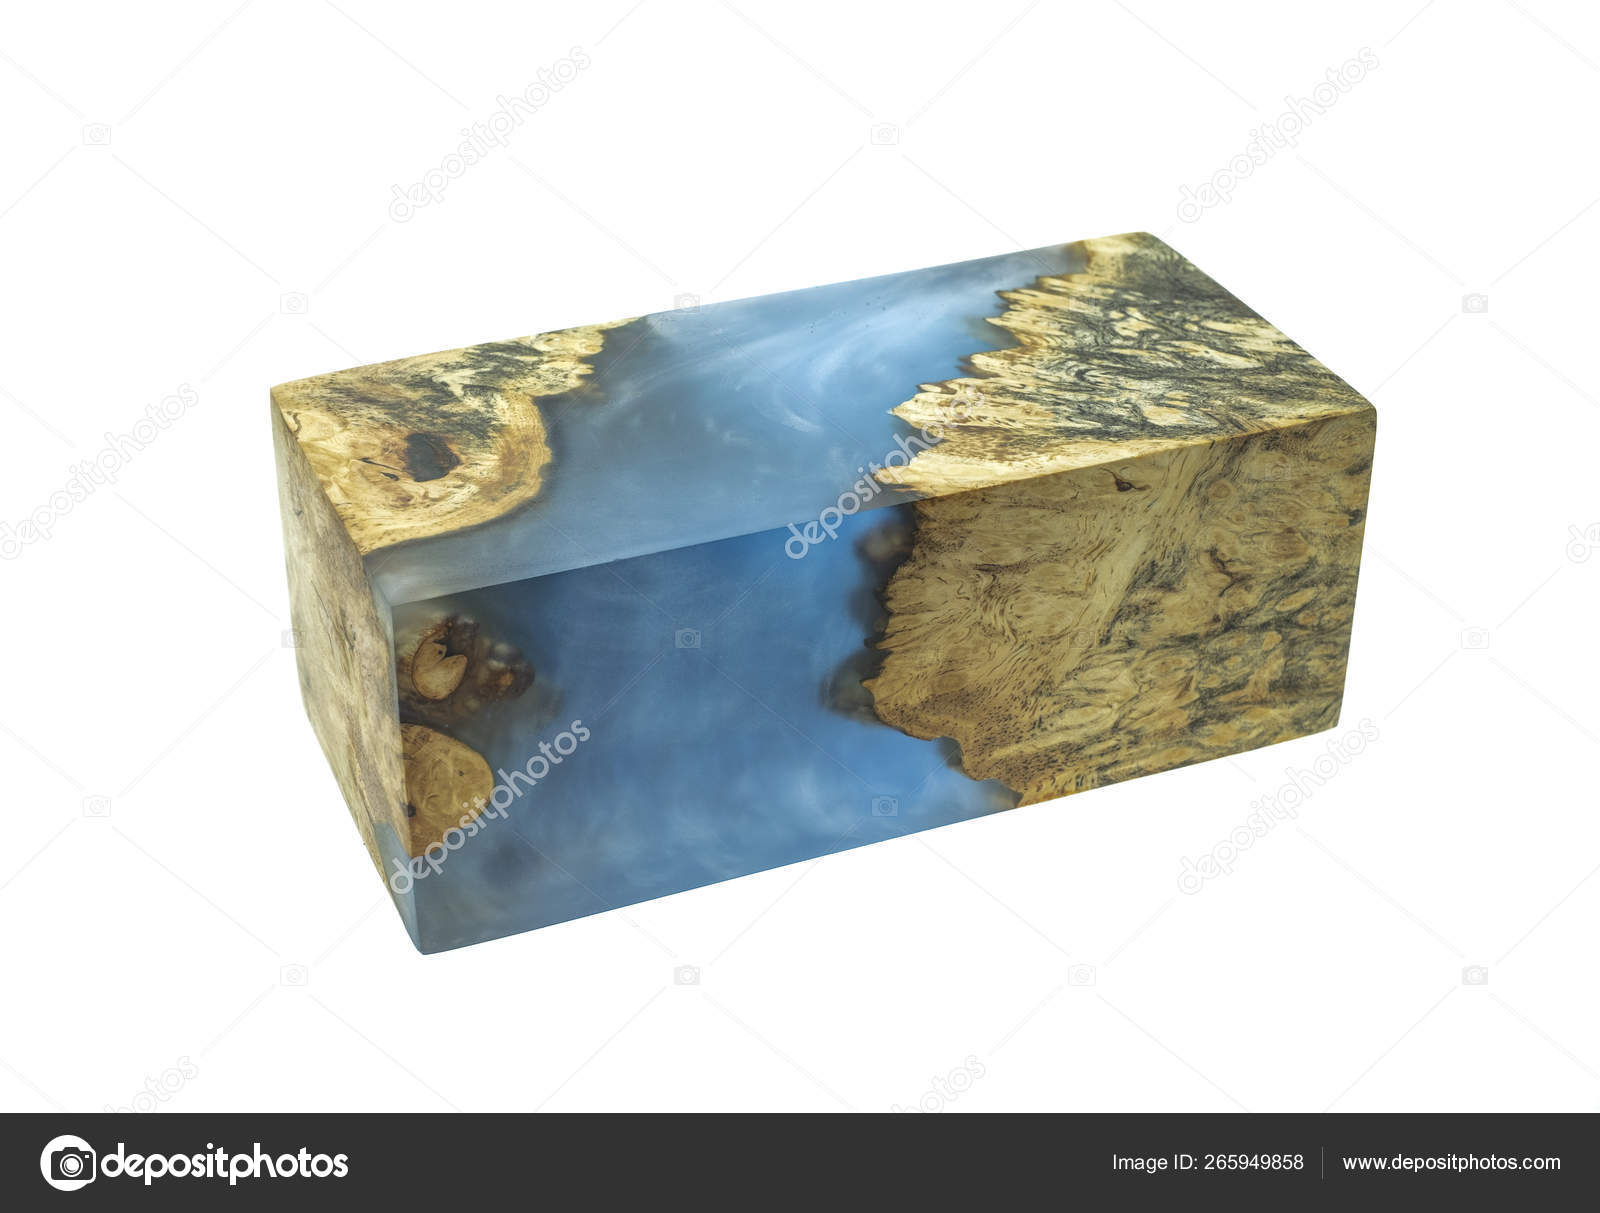 Casting Epoxy Resin Stabilizing Burl Afzelia Wood Color